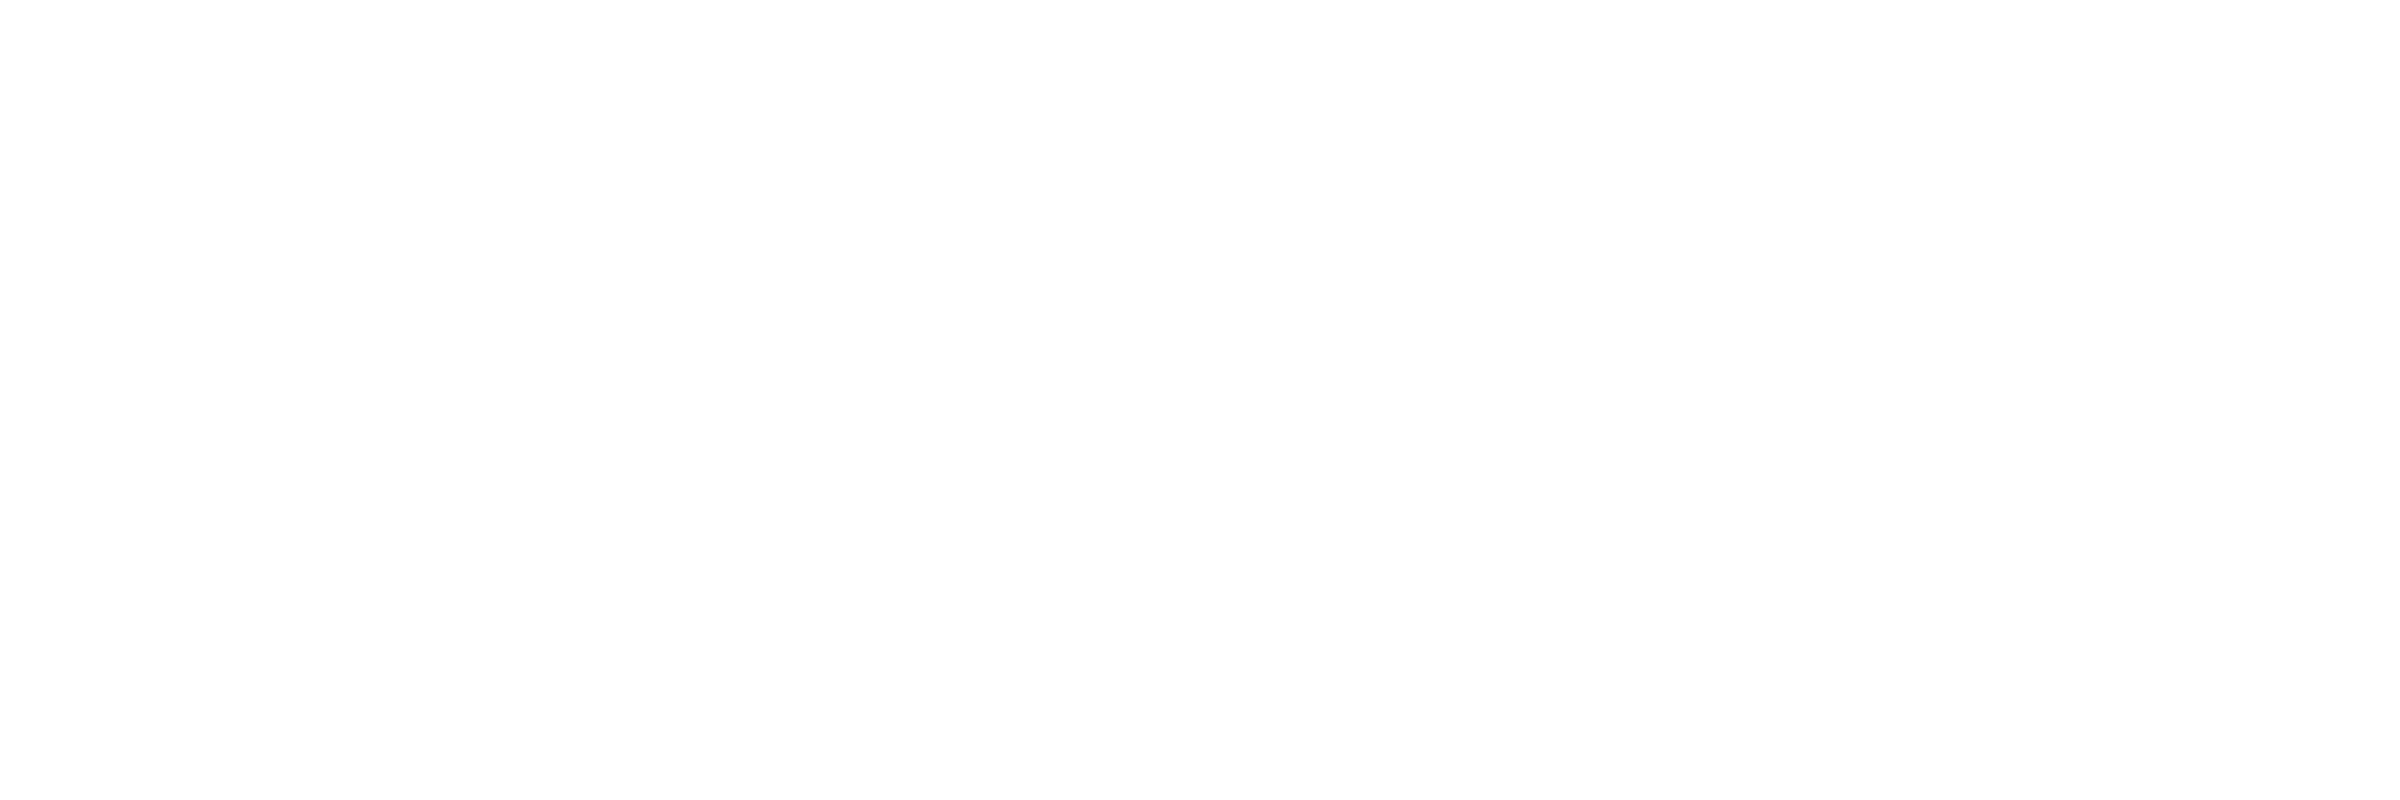 lenovo logo png transparent svg vector freebie supply lenovo logo png transparent svg